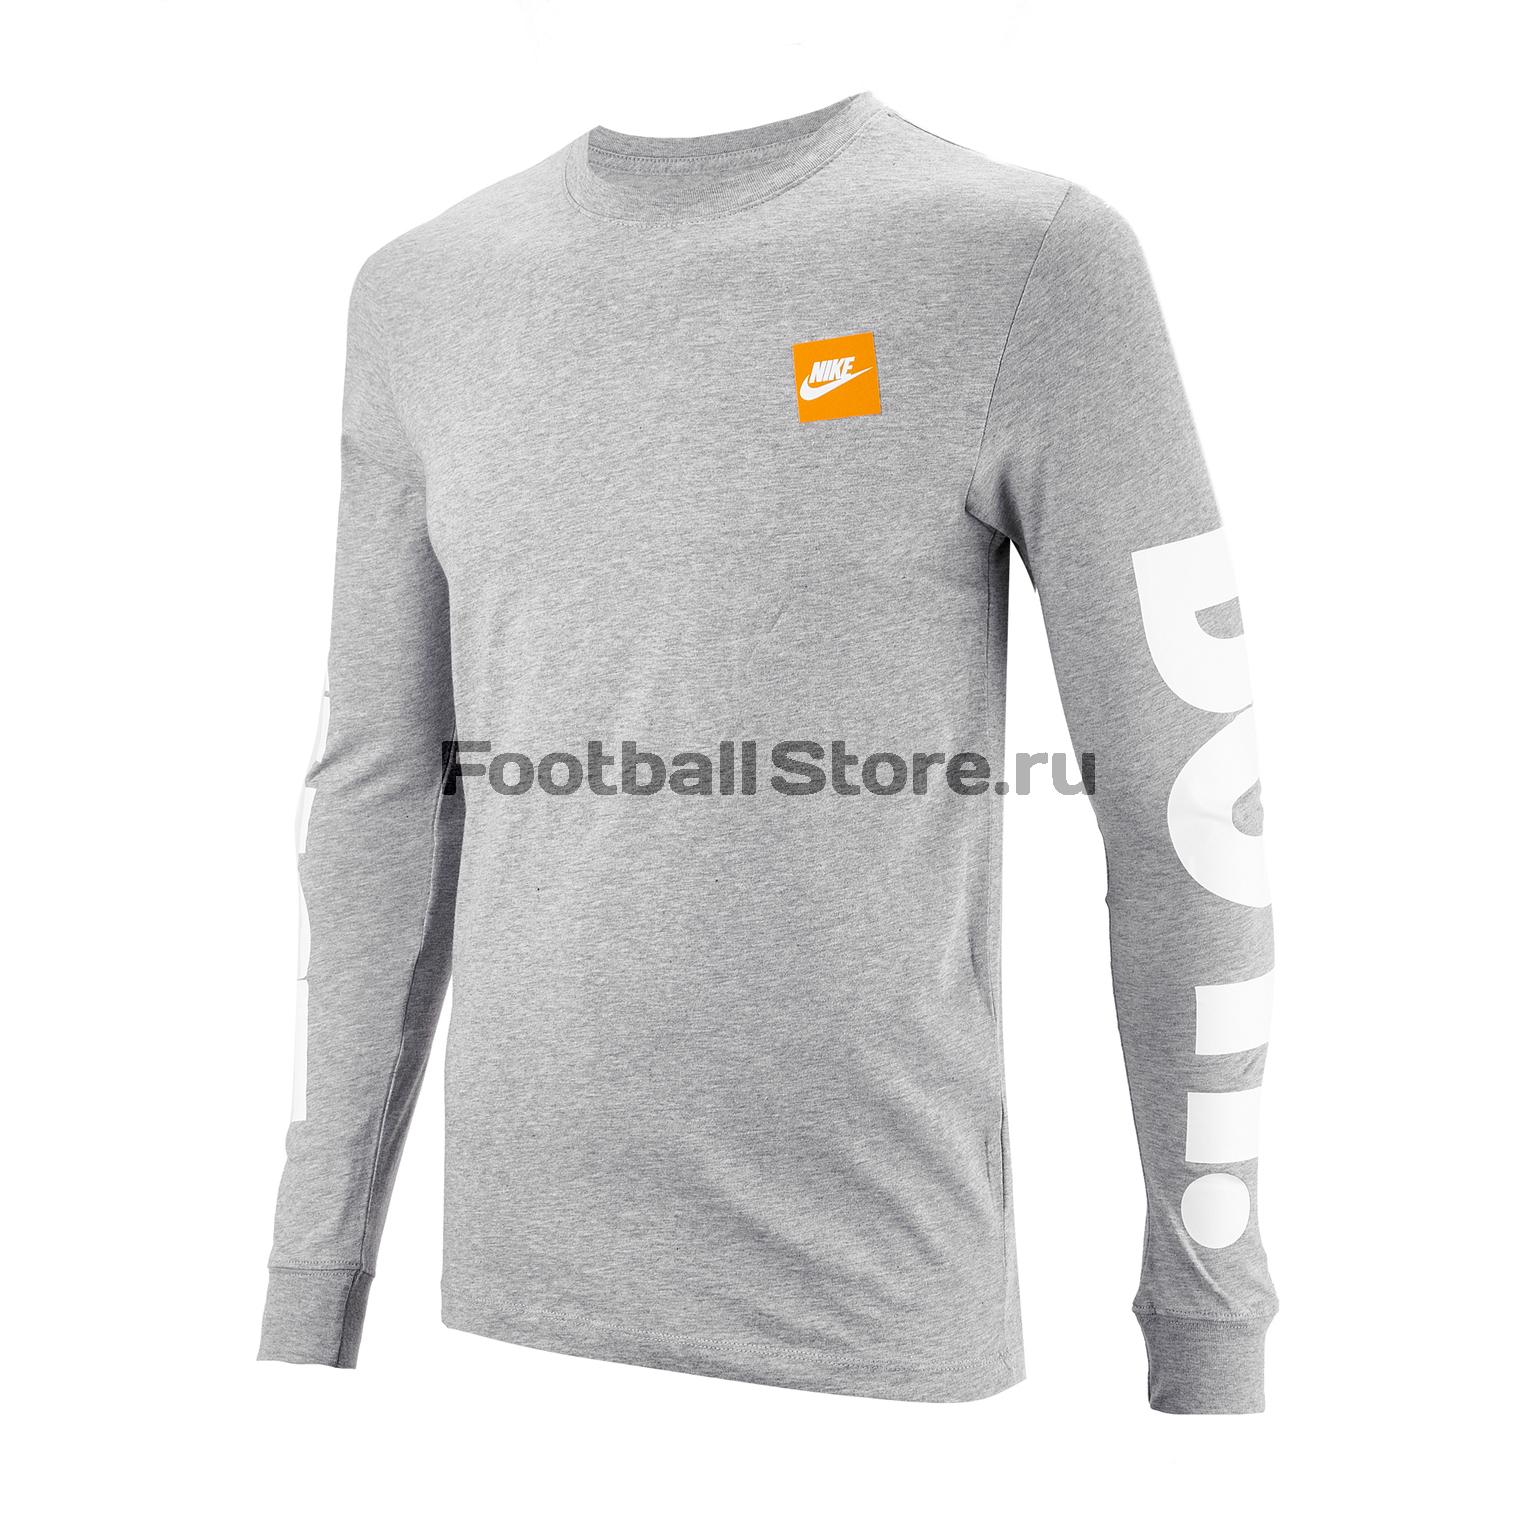 Футболка Nike Tee LS AR5197-063 футболка just do it nike